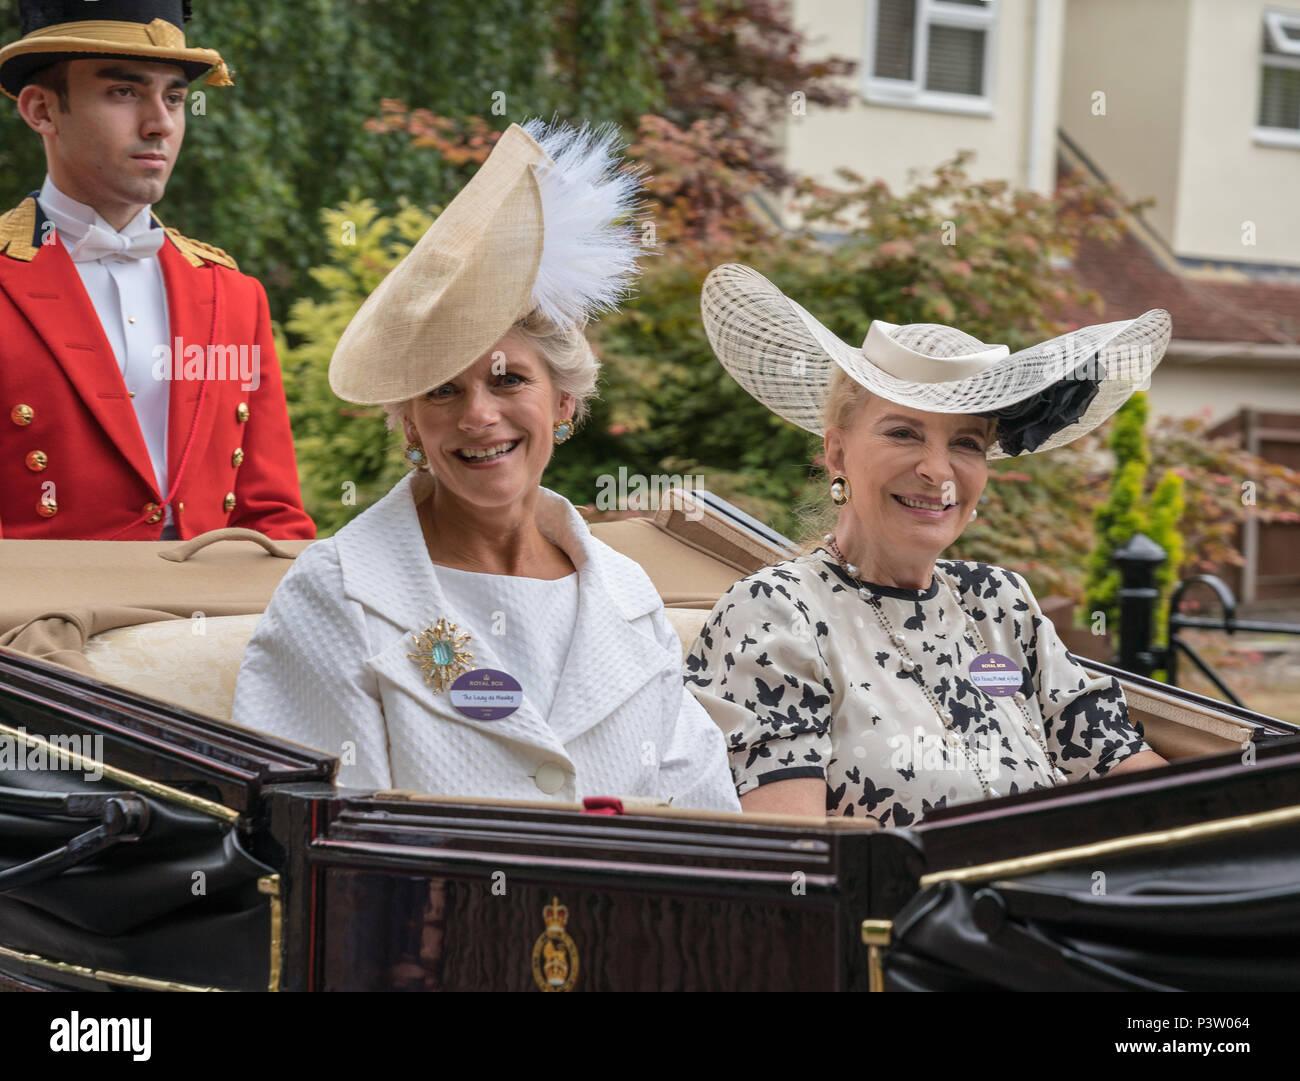 Royal Ascot, Berkshire, UK. 19th Jun, 2018. Royal Ascot Carriage Procession Credit: Chris Miller/Alamy Live News - Stock Image